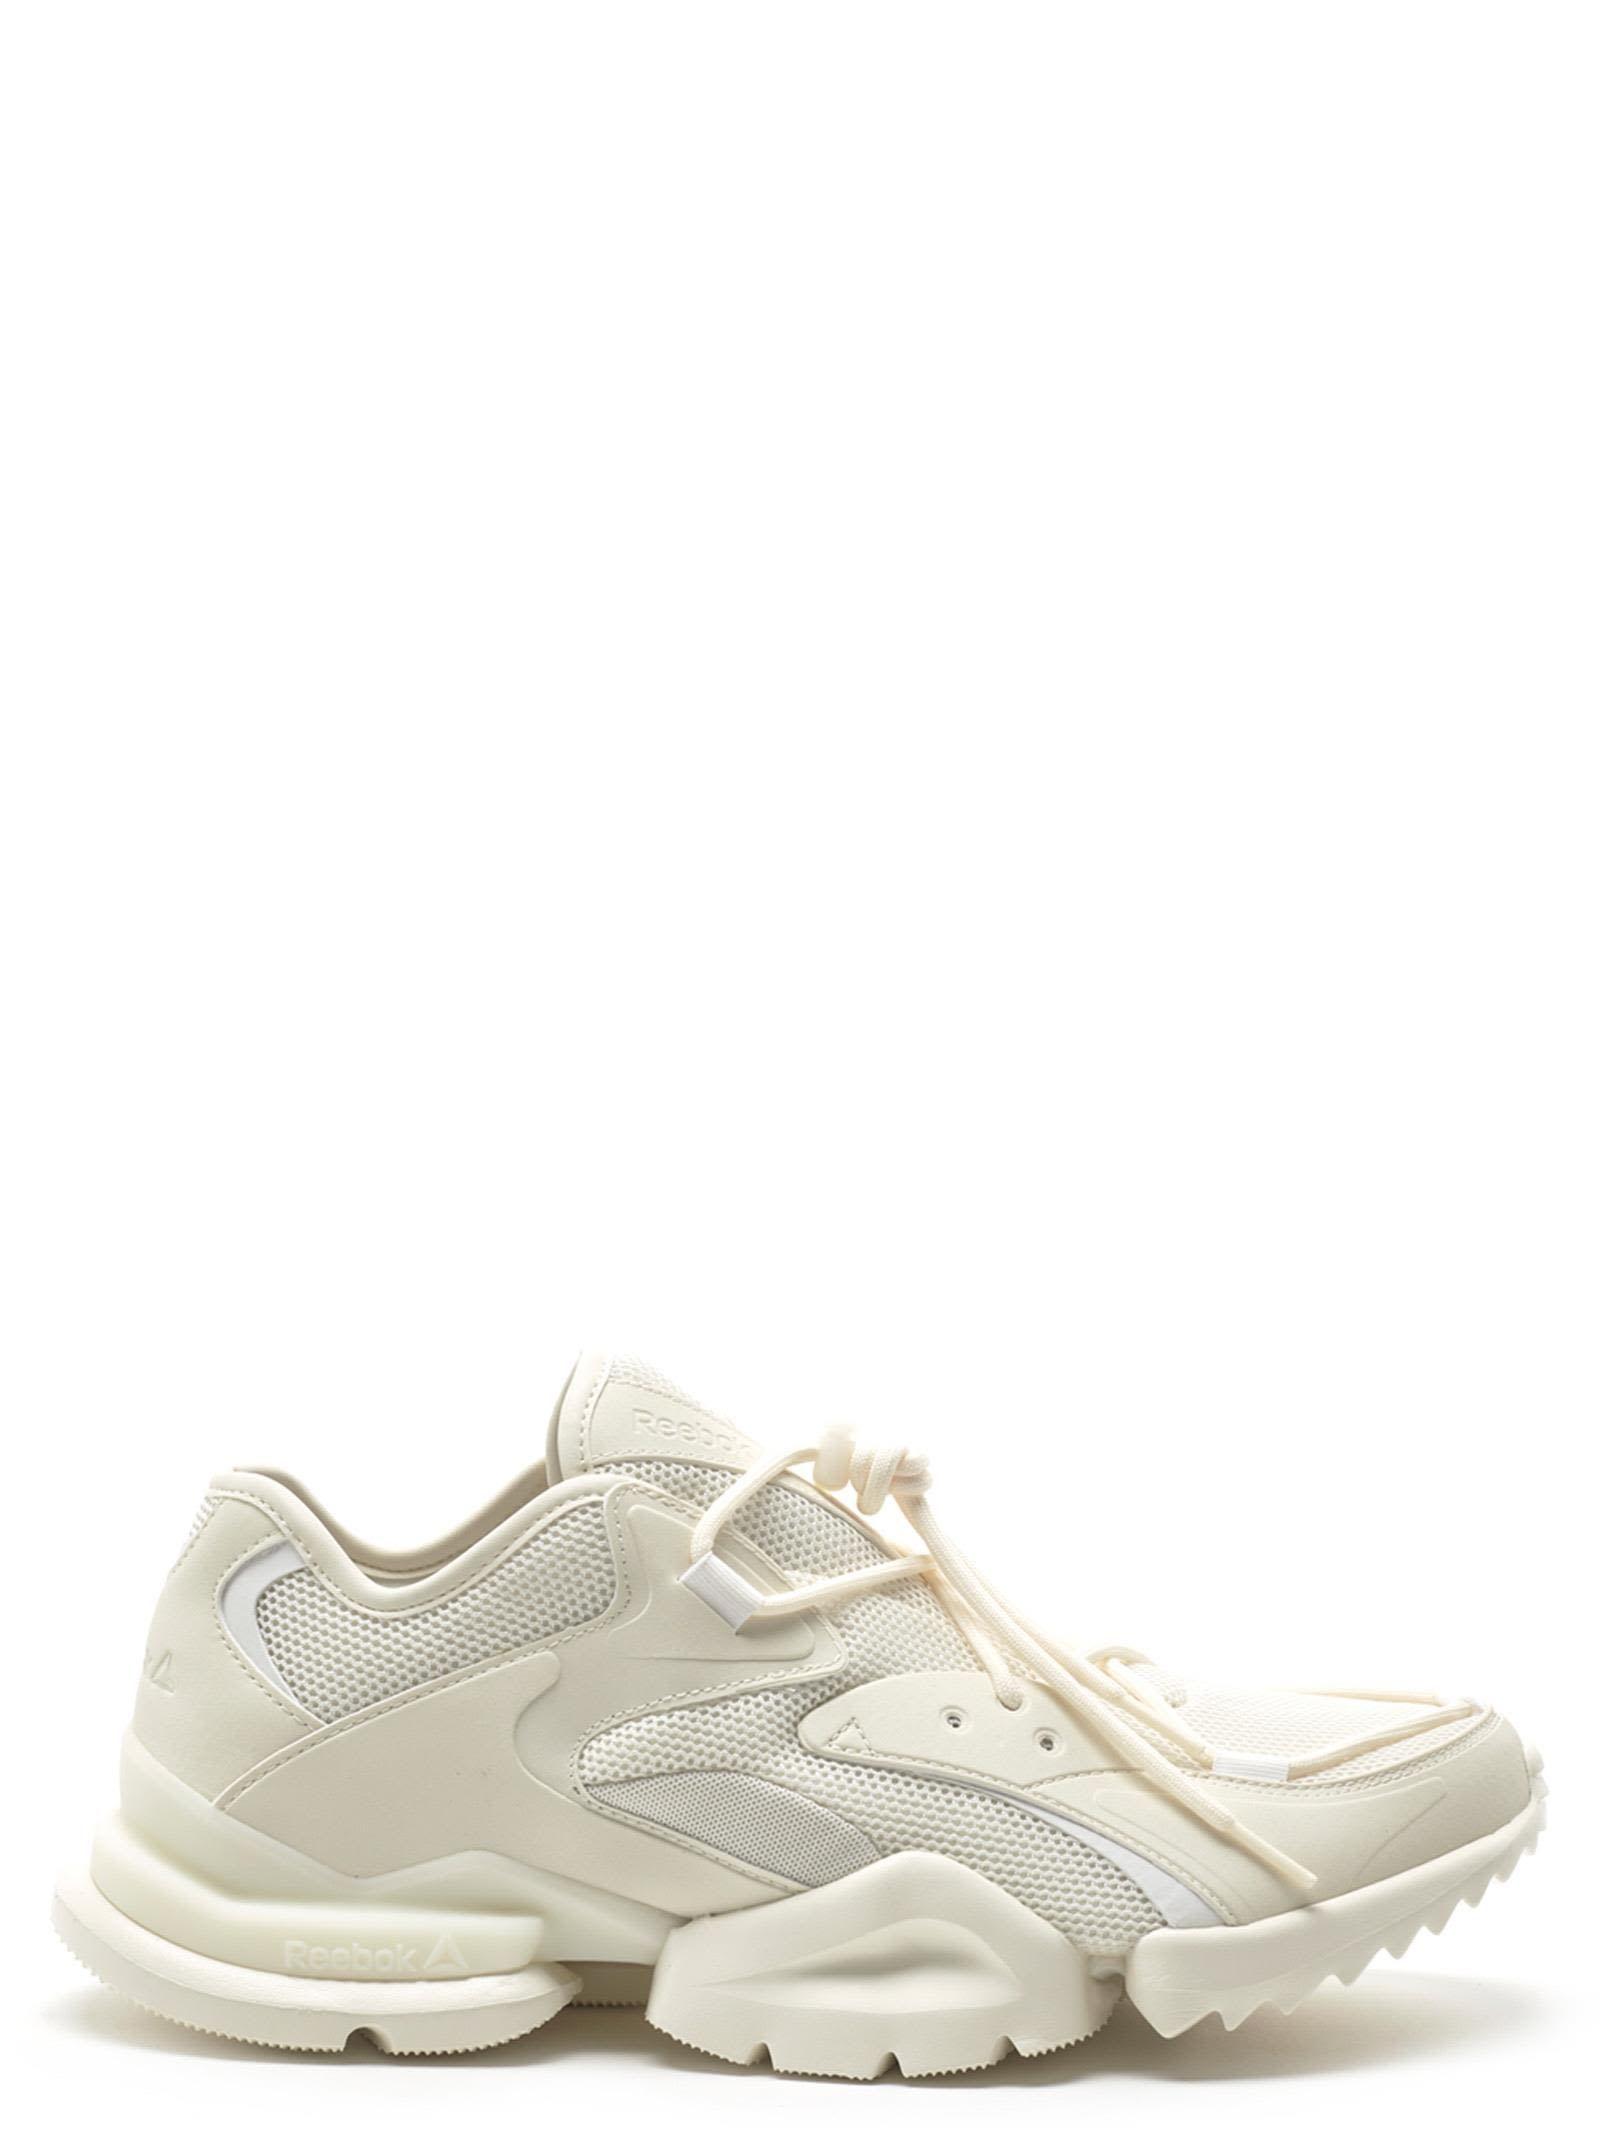 cacebe2494da Reebok Run R 96 Sneakers In Chalk Wht